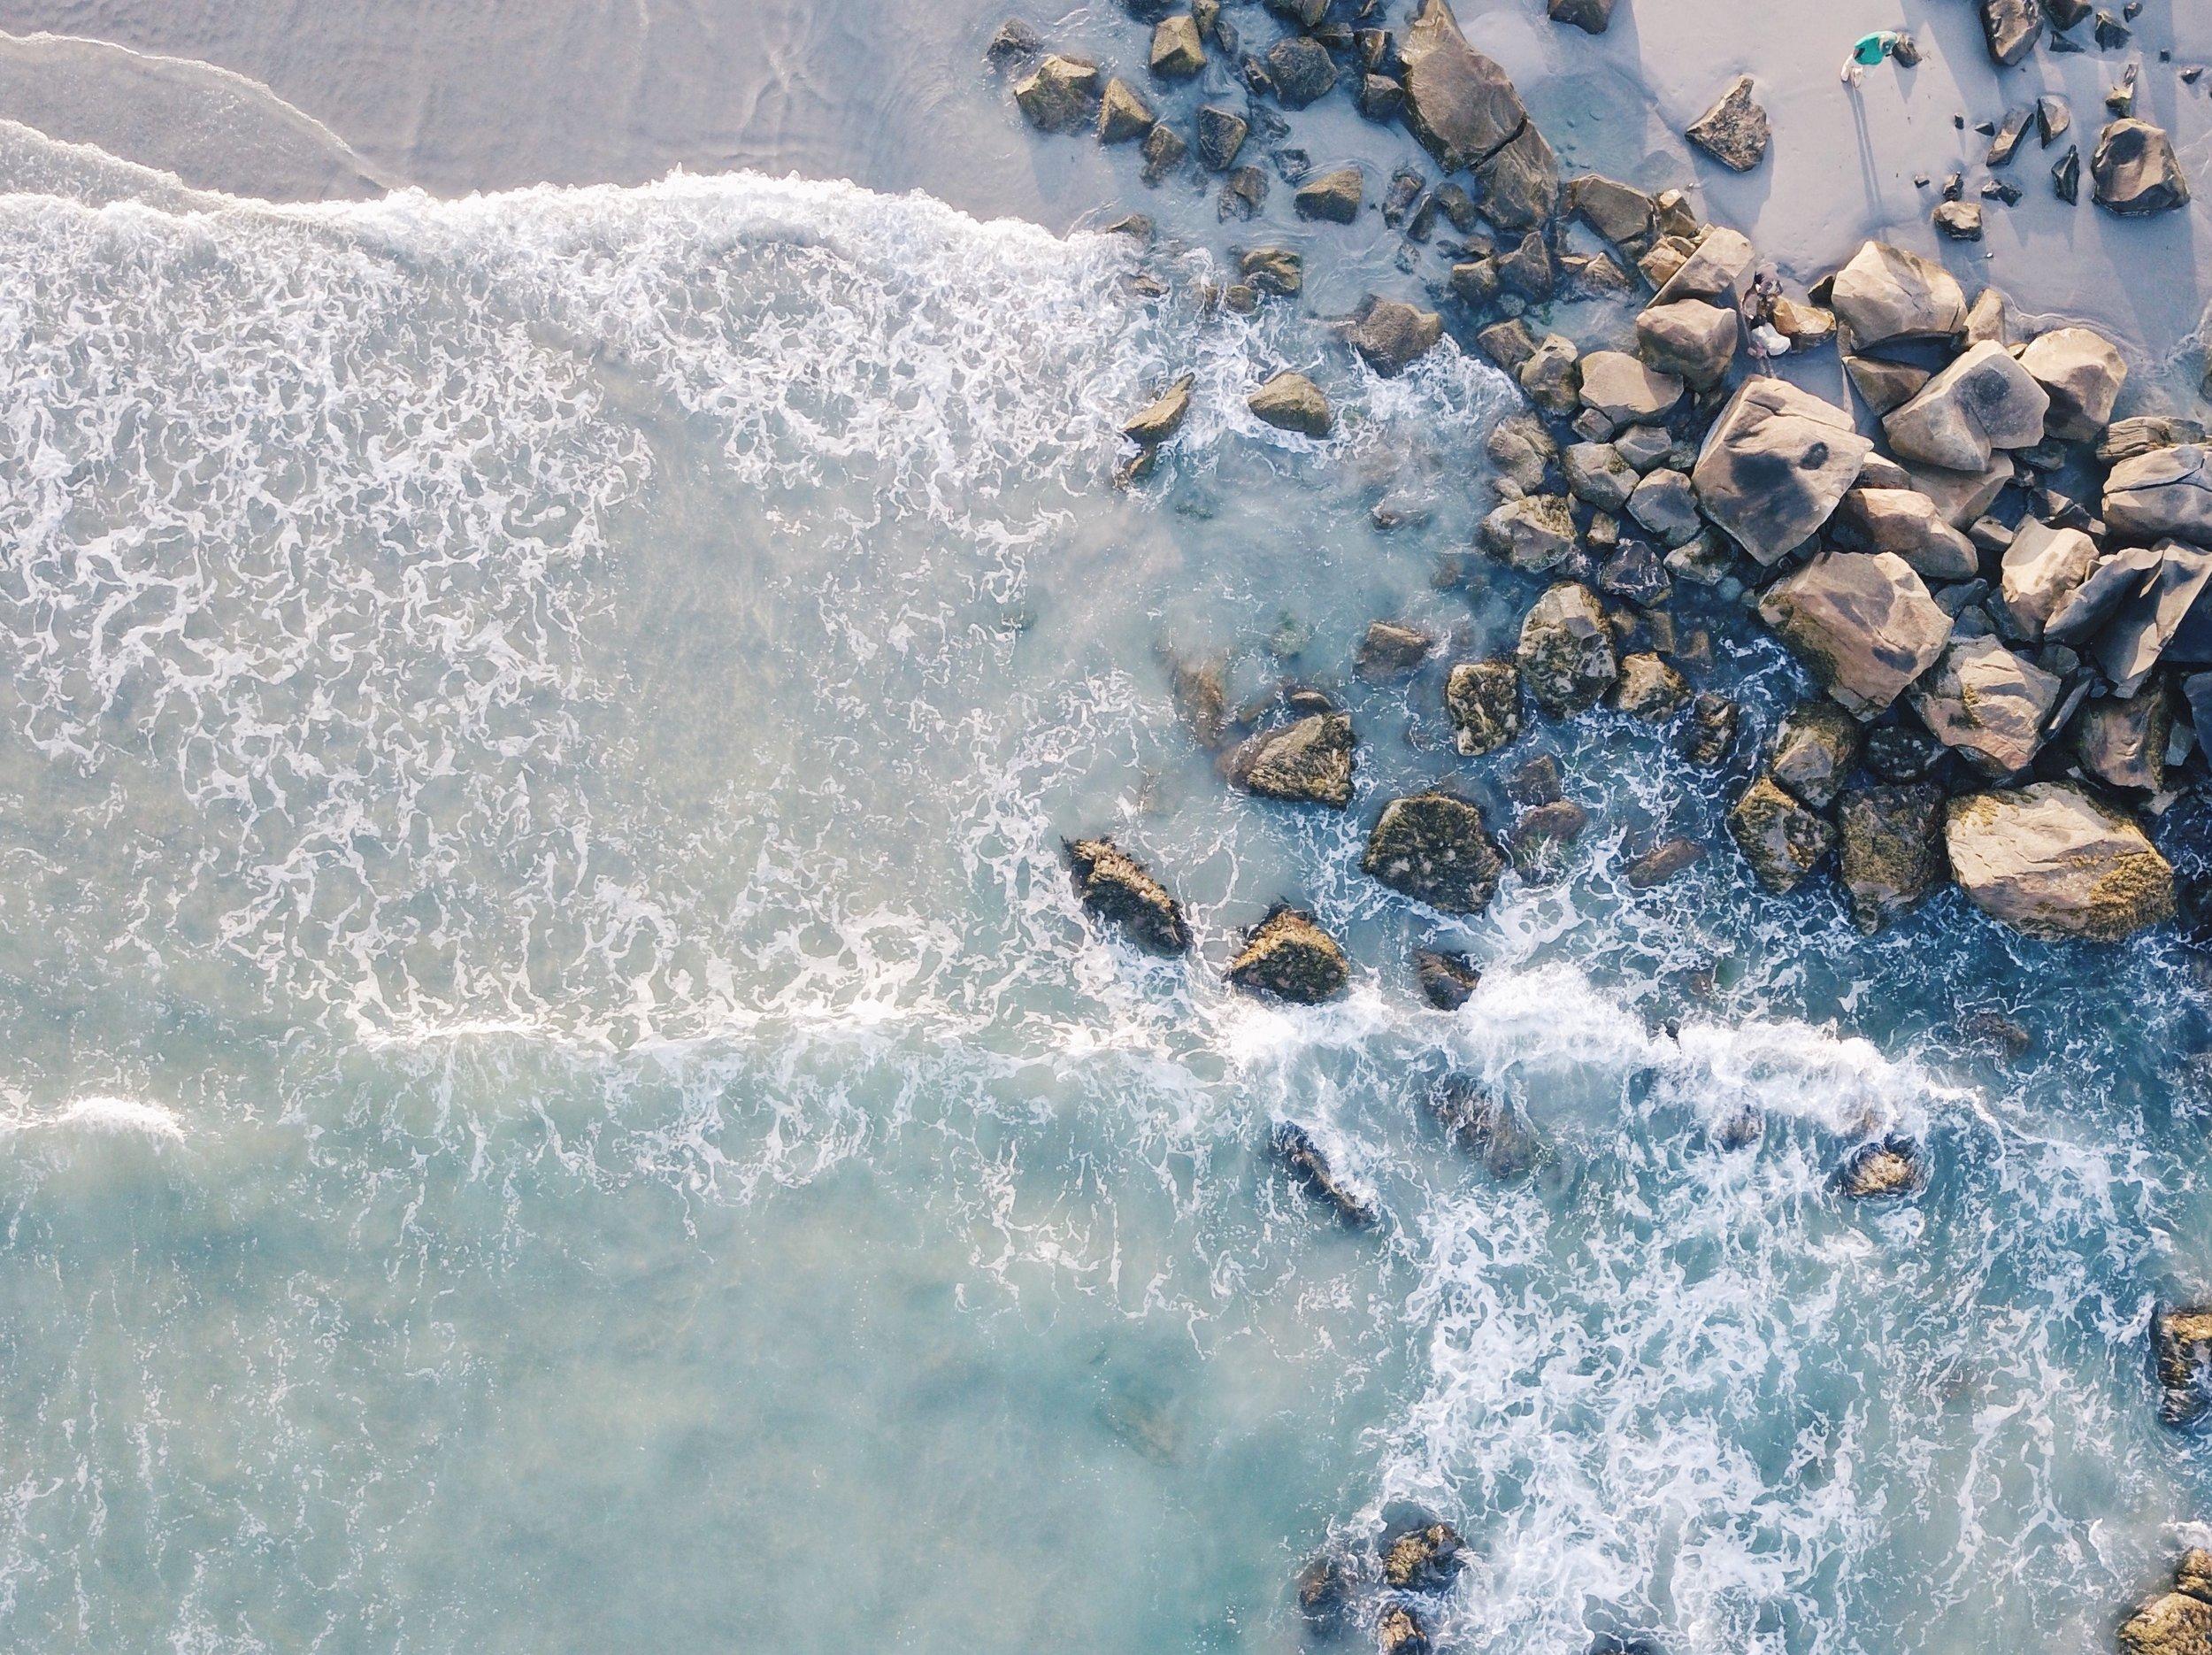 ruth-troughton-384709-unsplash ocean.jpg